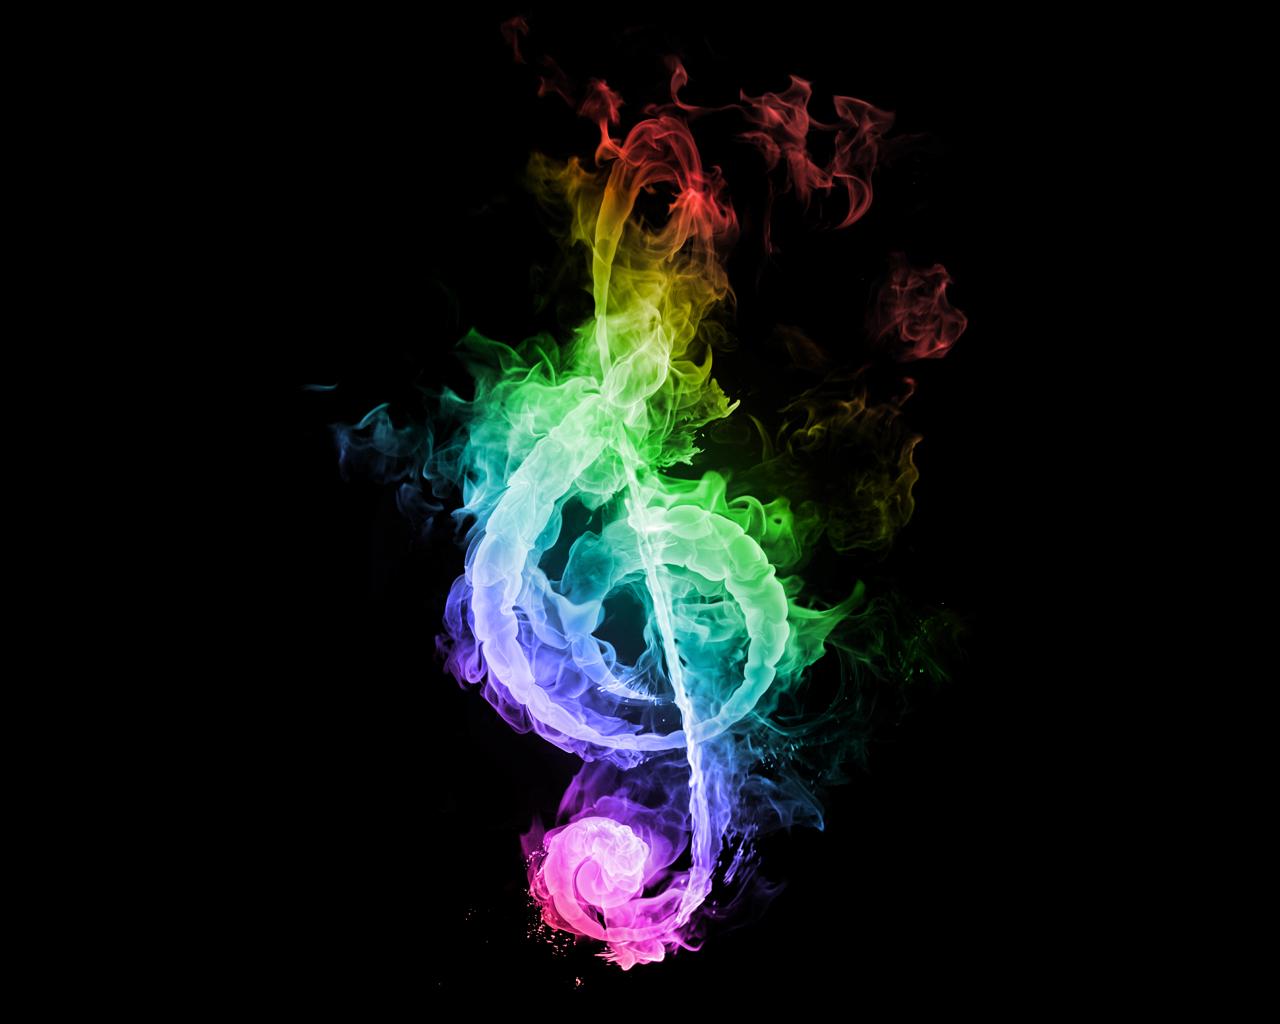 Music Abstract Wallpaper - WallpaperSafari